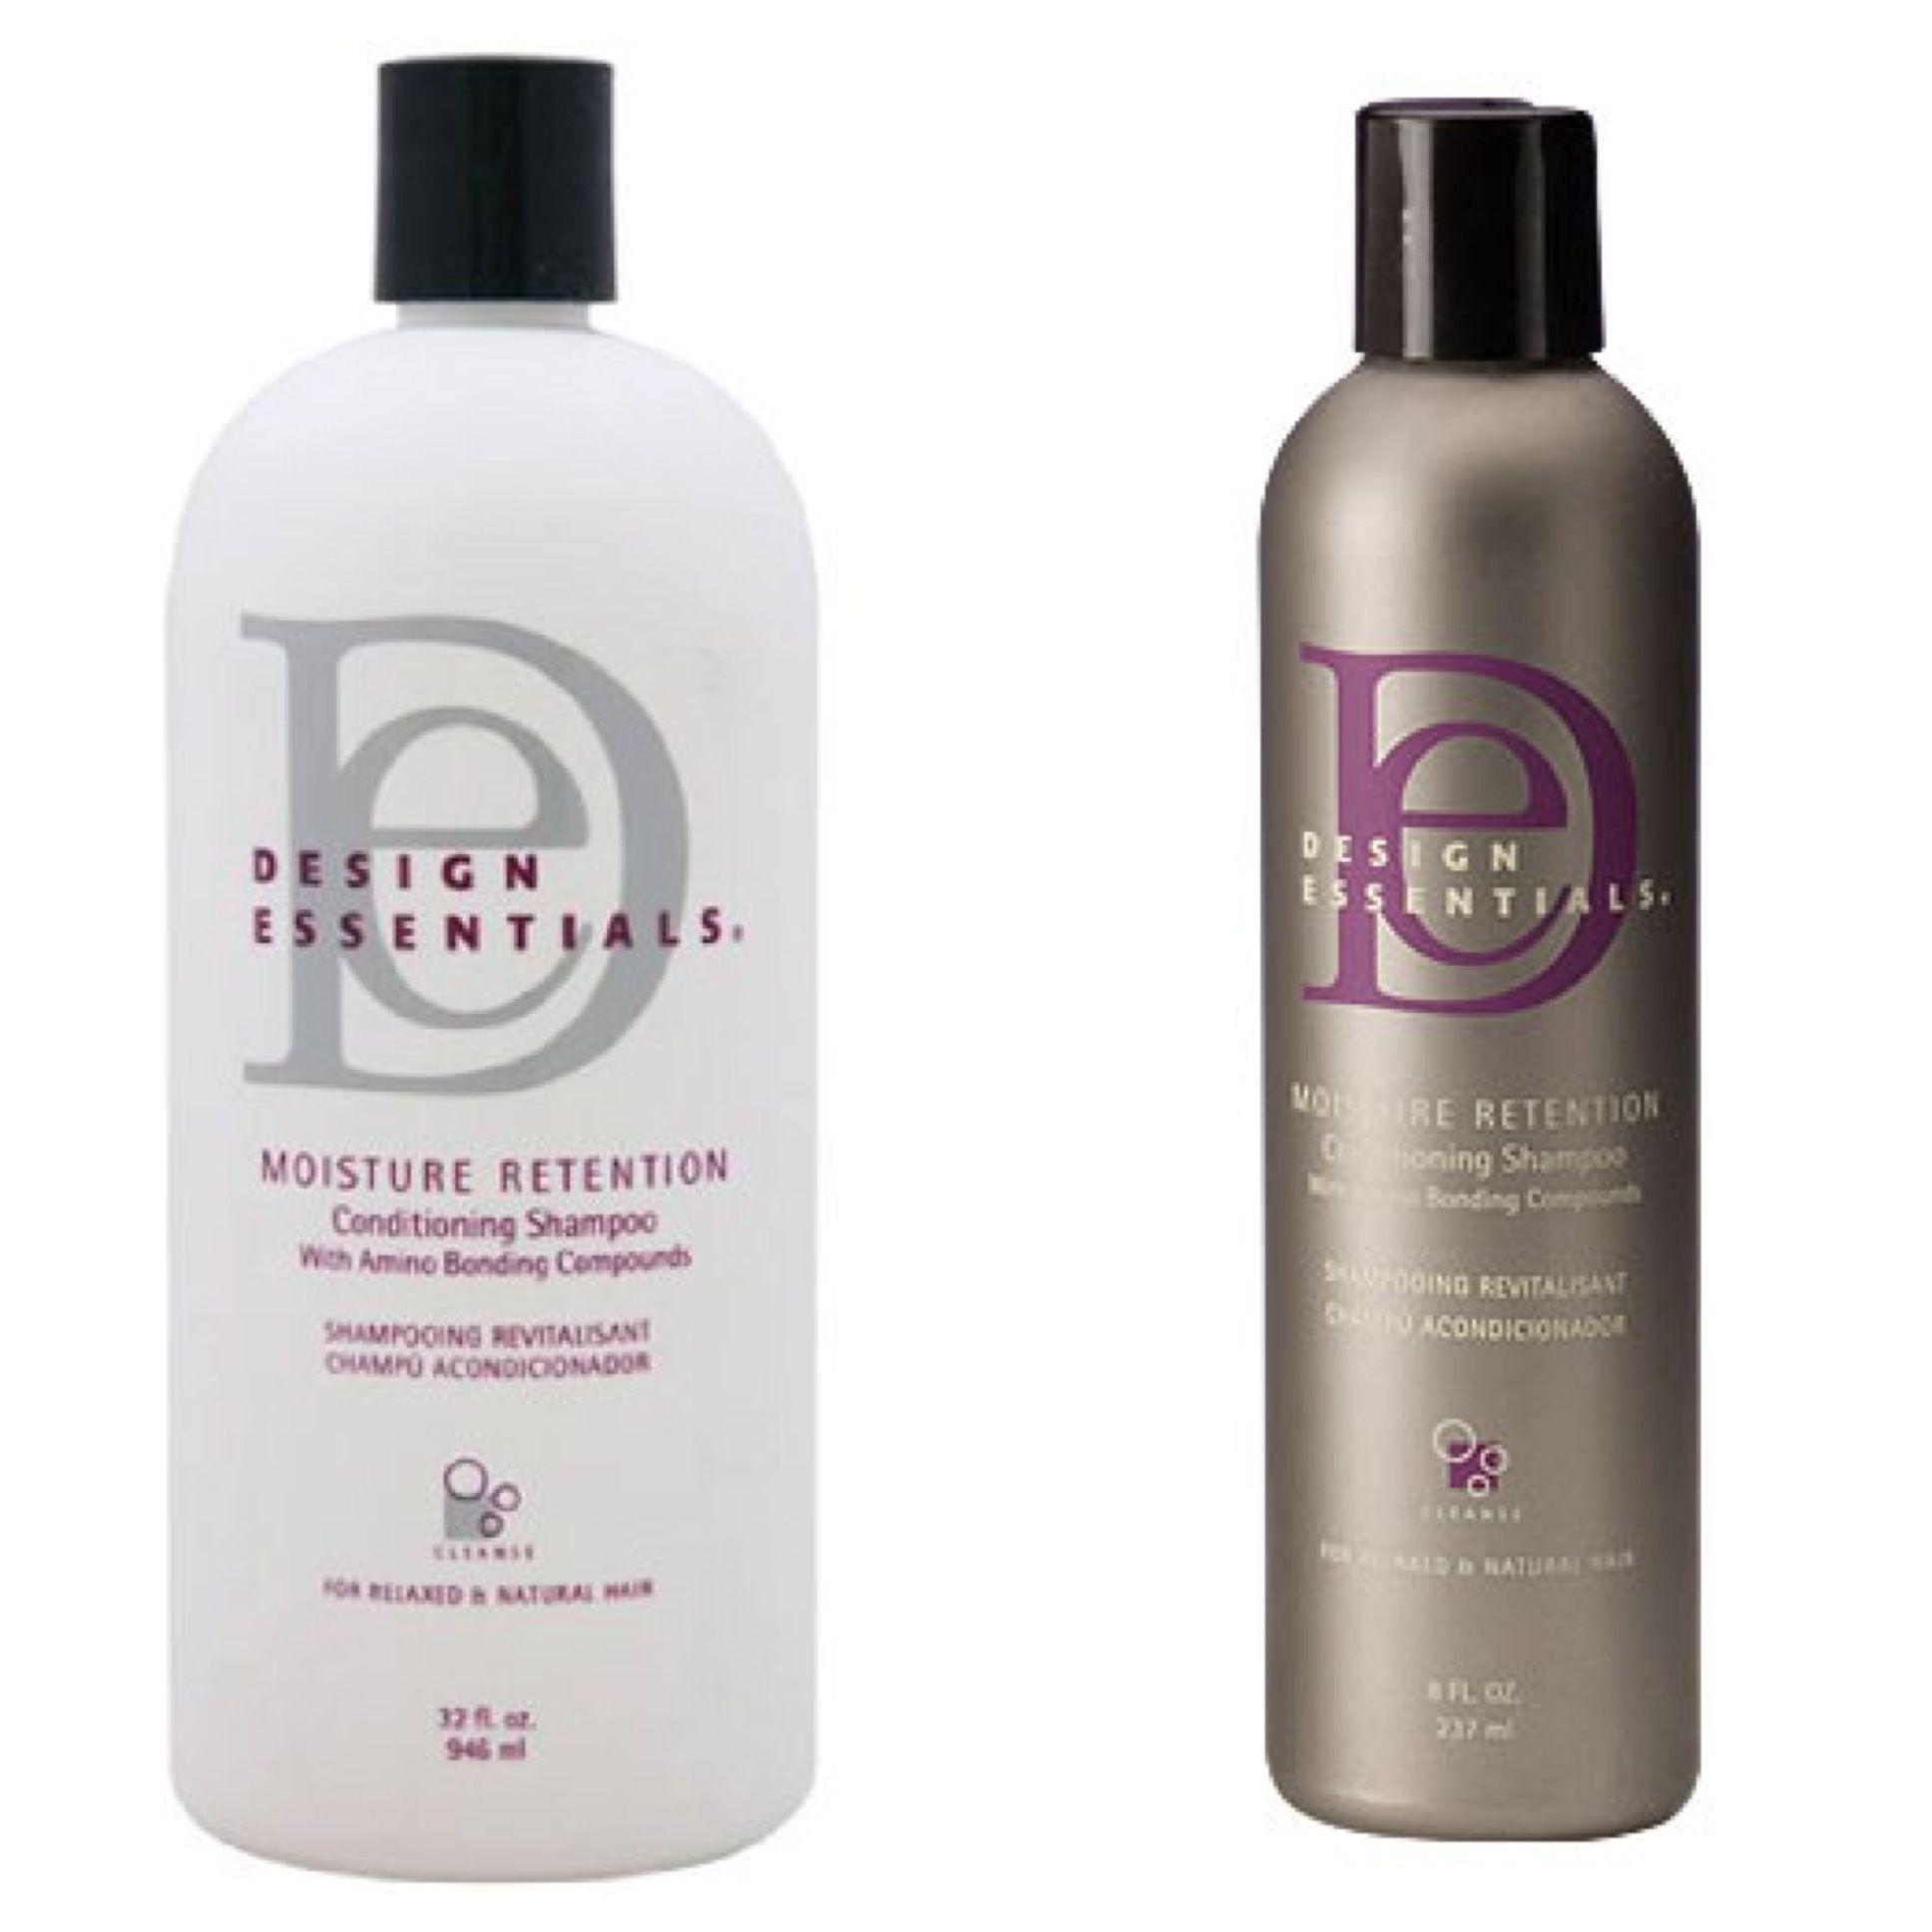 Design Essentials Moisture Retention Shampoo And Stimulations Conditioner Design Essentials Hair Products Conditioning Shampoo Design Essentials